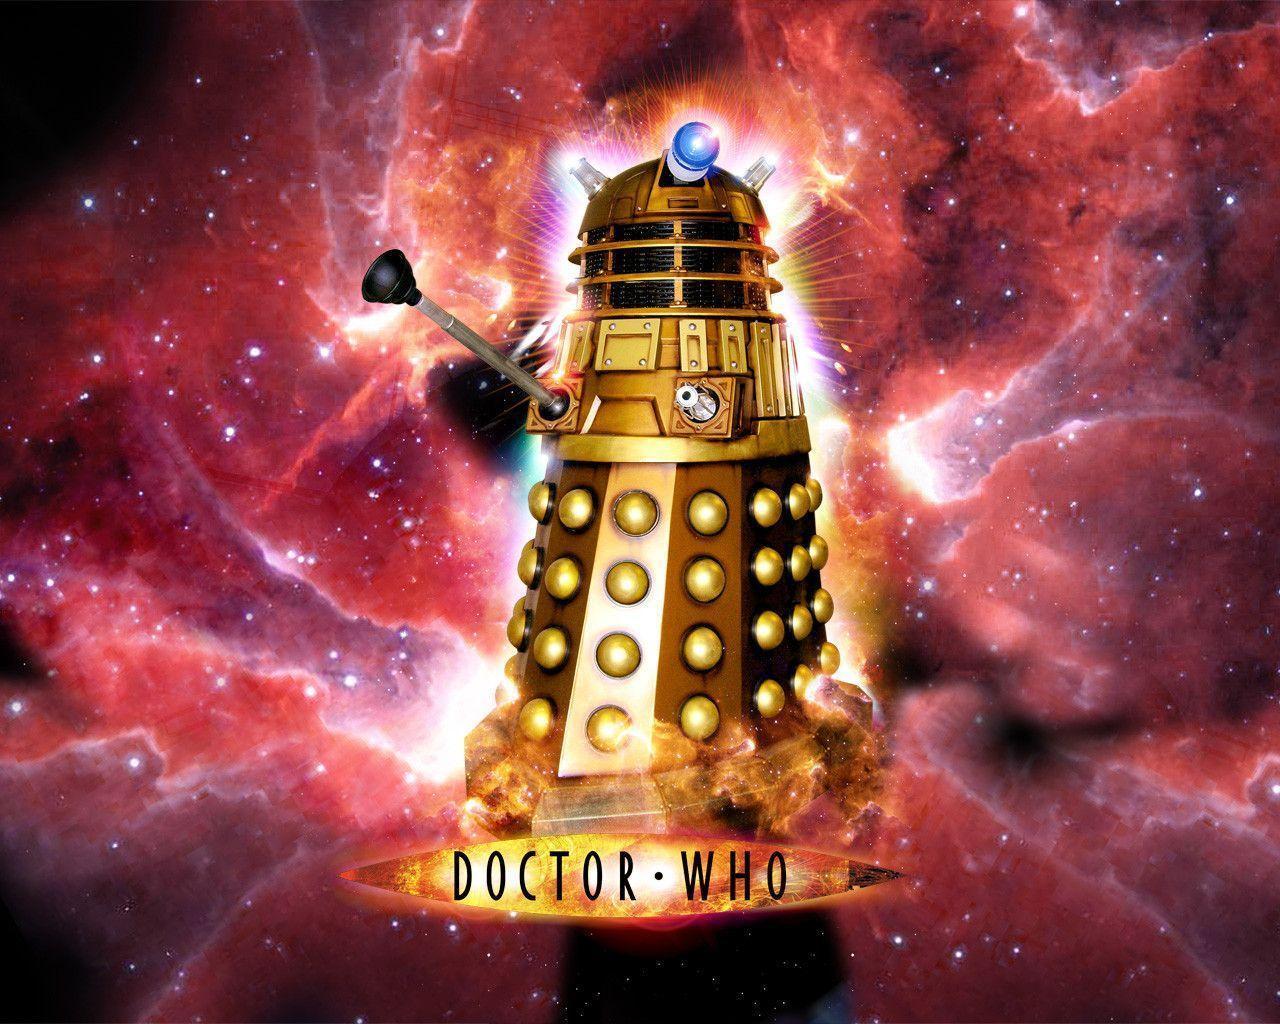 Doctor Who Wallpaper Dalek Exterminate Dalek Wallpapers - Wal...